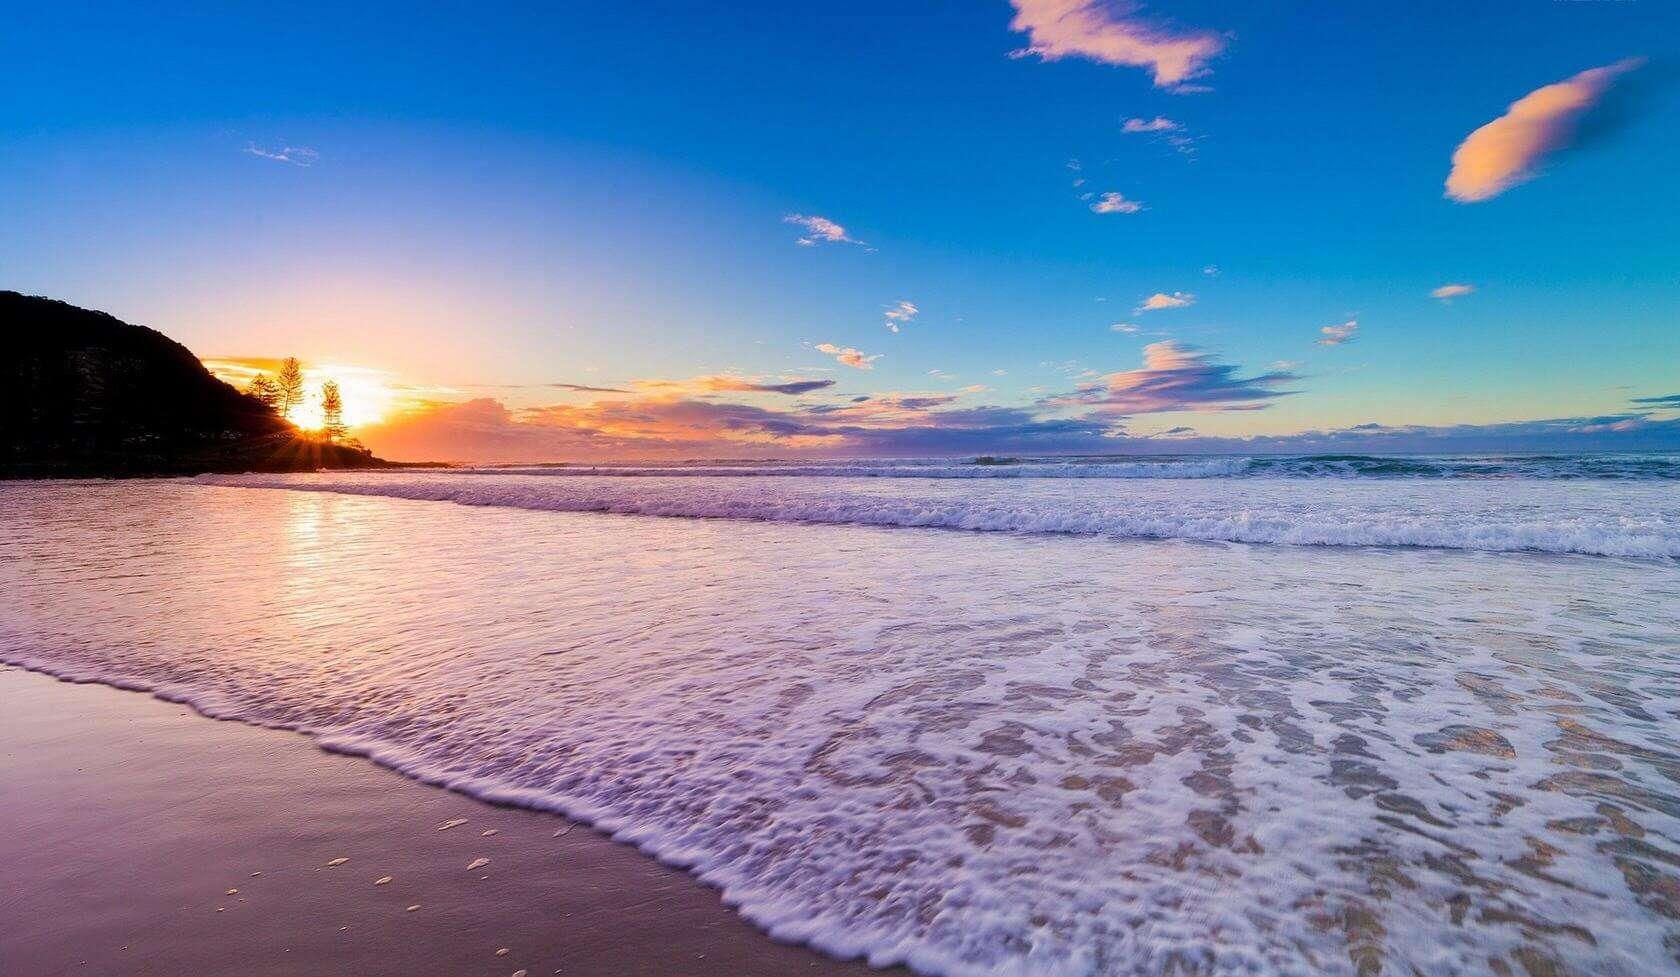 Serenity Beach 2